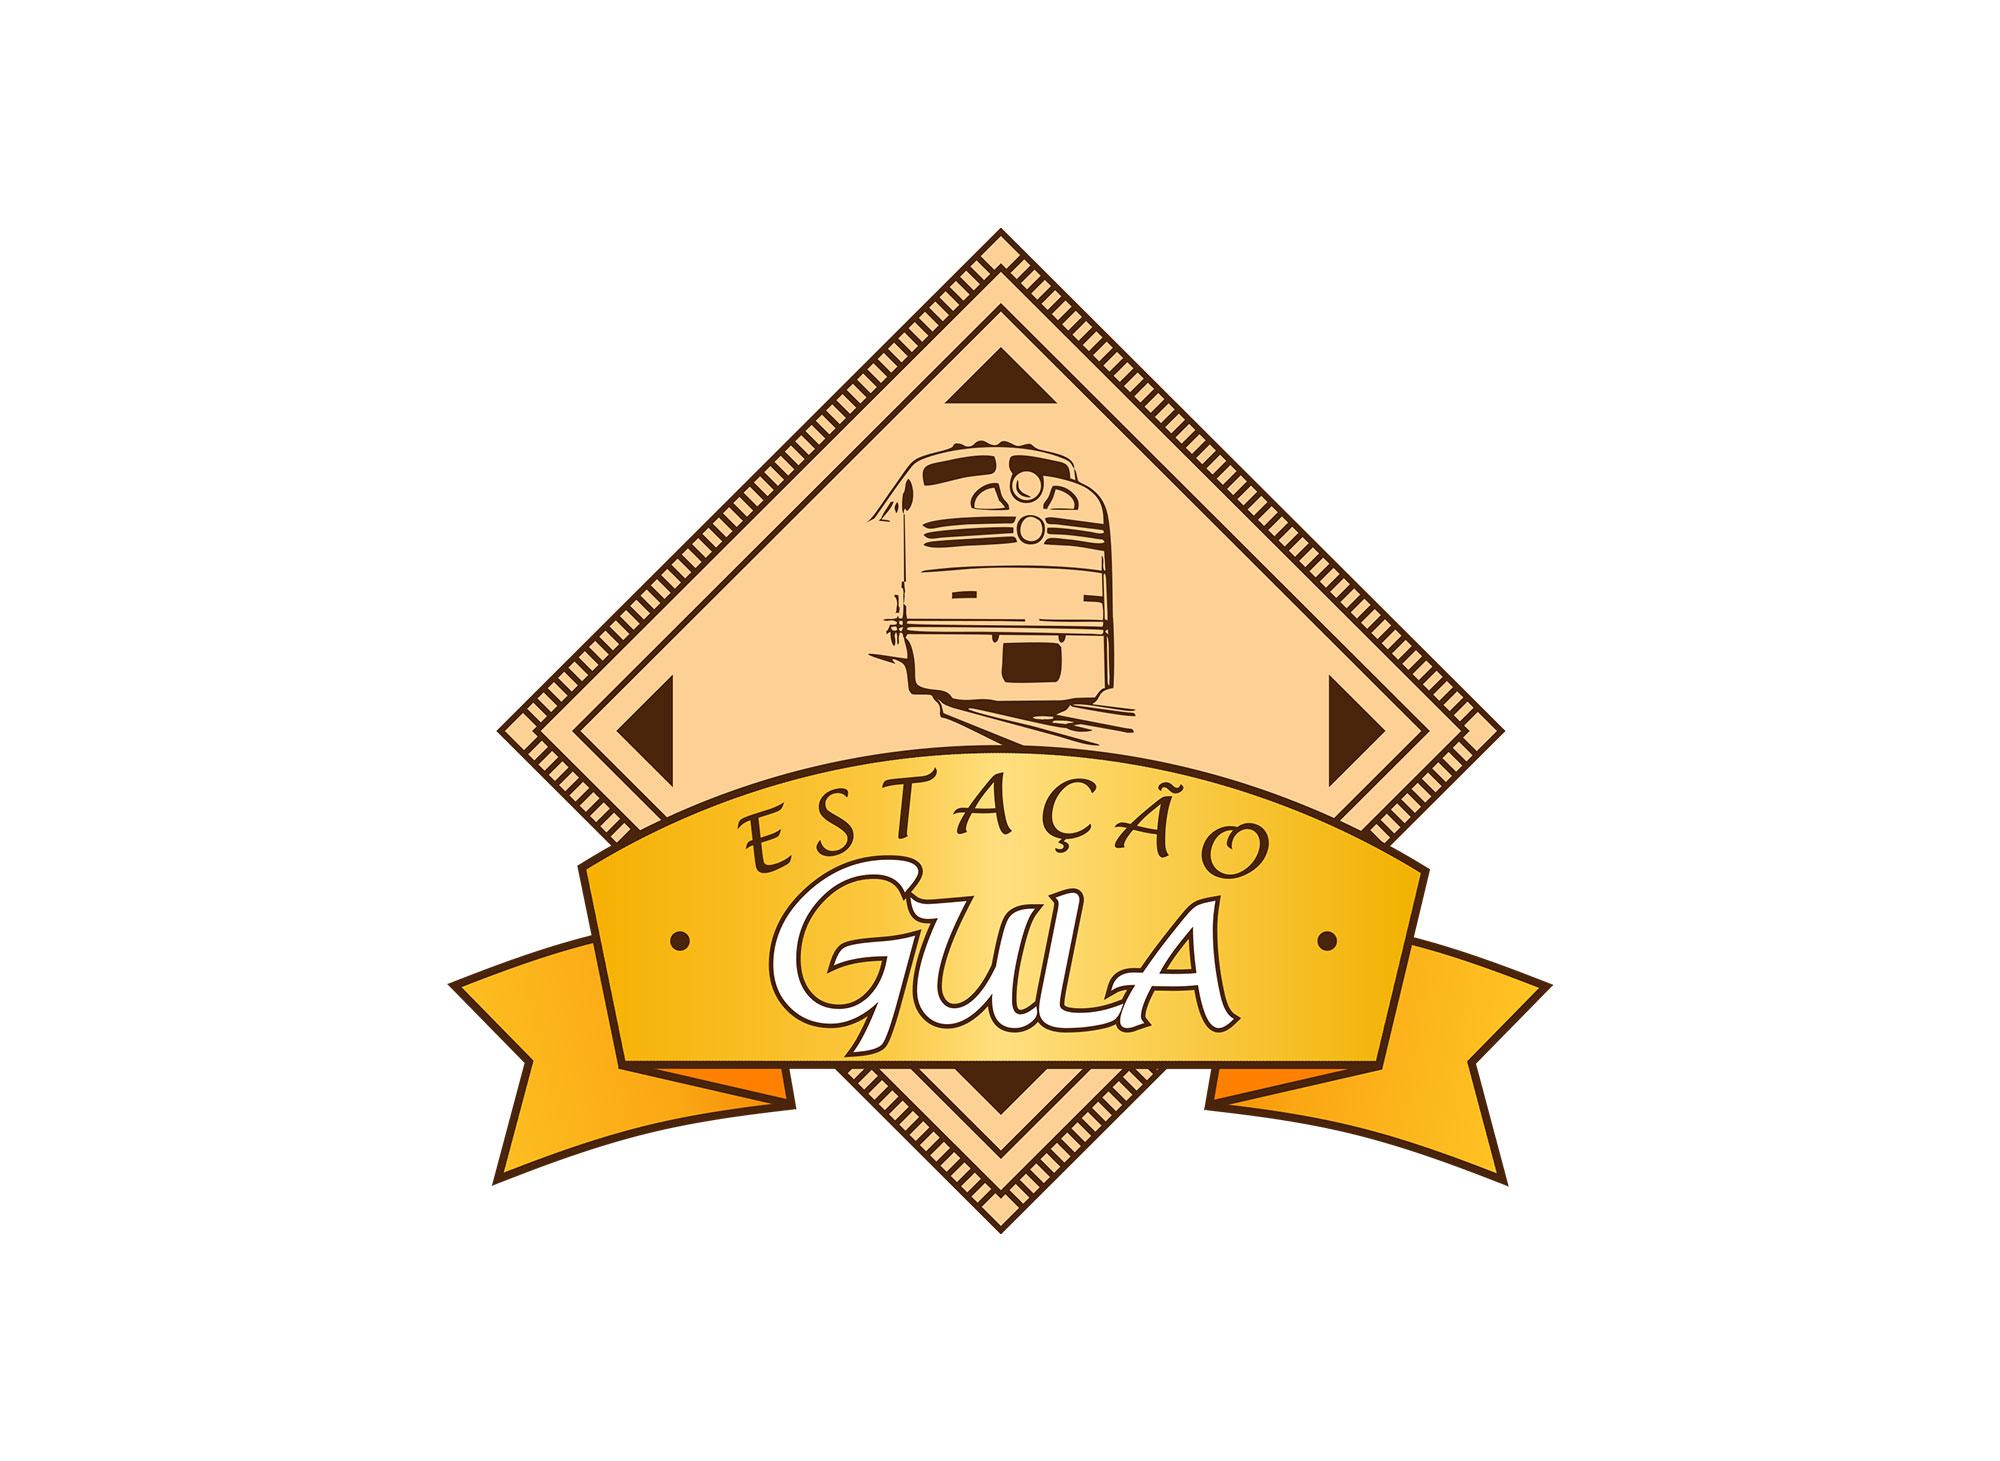 estacao-gula-cliente-agencia-diretriz-digital-marketing-fortaleza